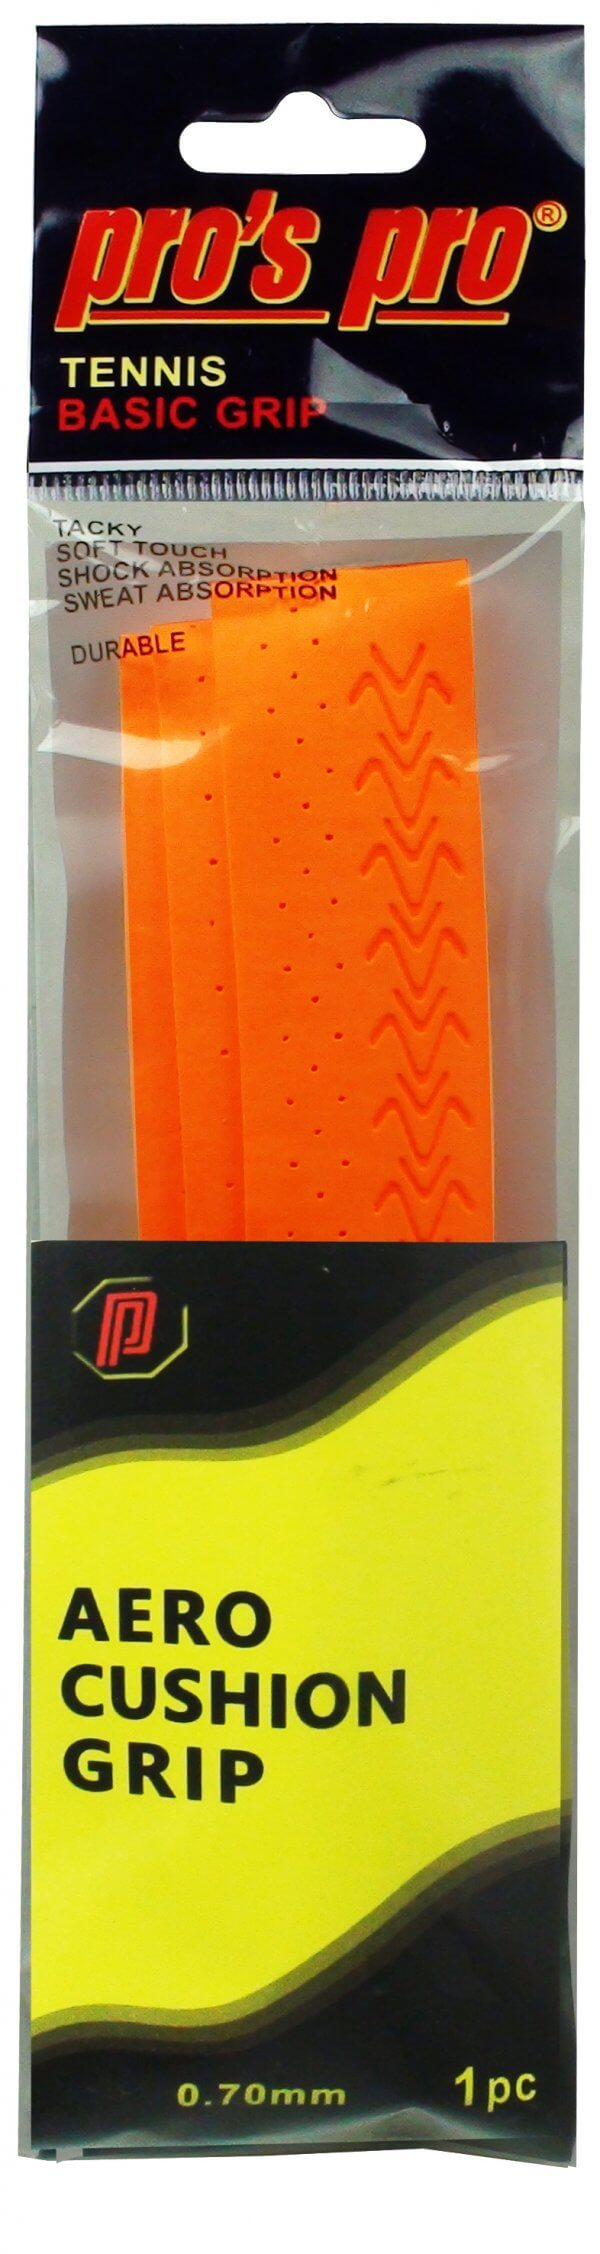 Pro's Pro Aero Cushion Grip orange